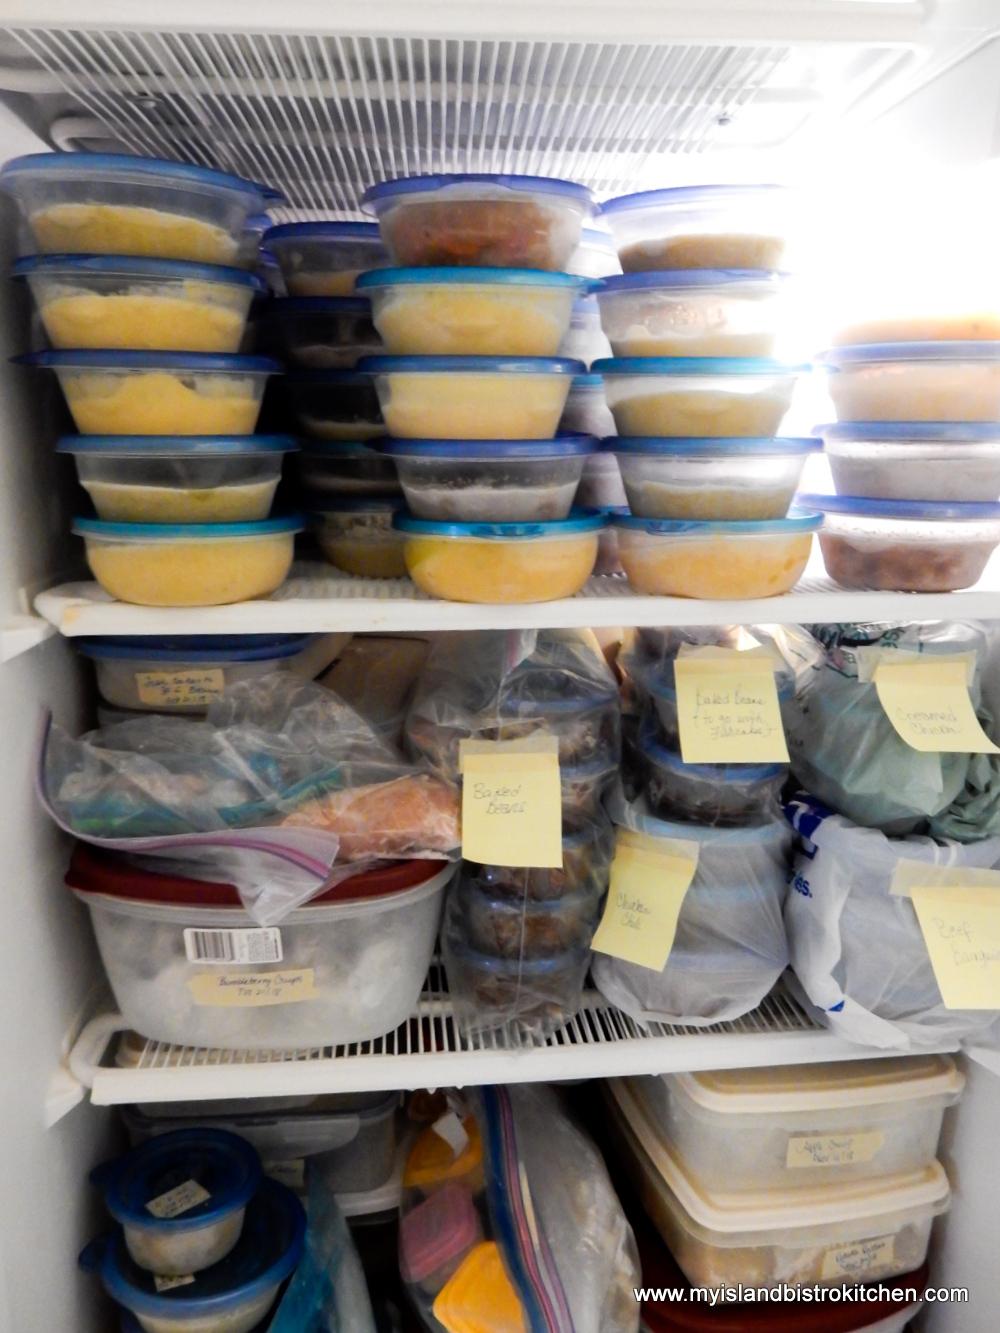 Frozen Homemade Make-ahead Meals